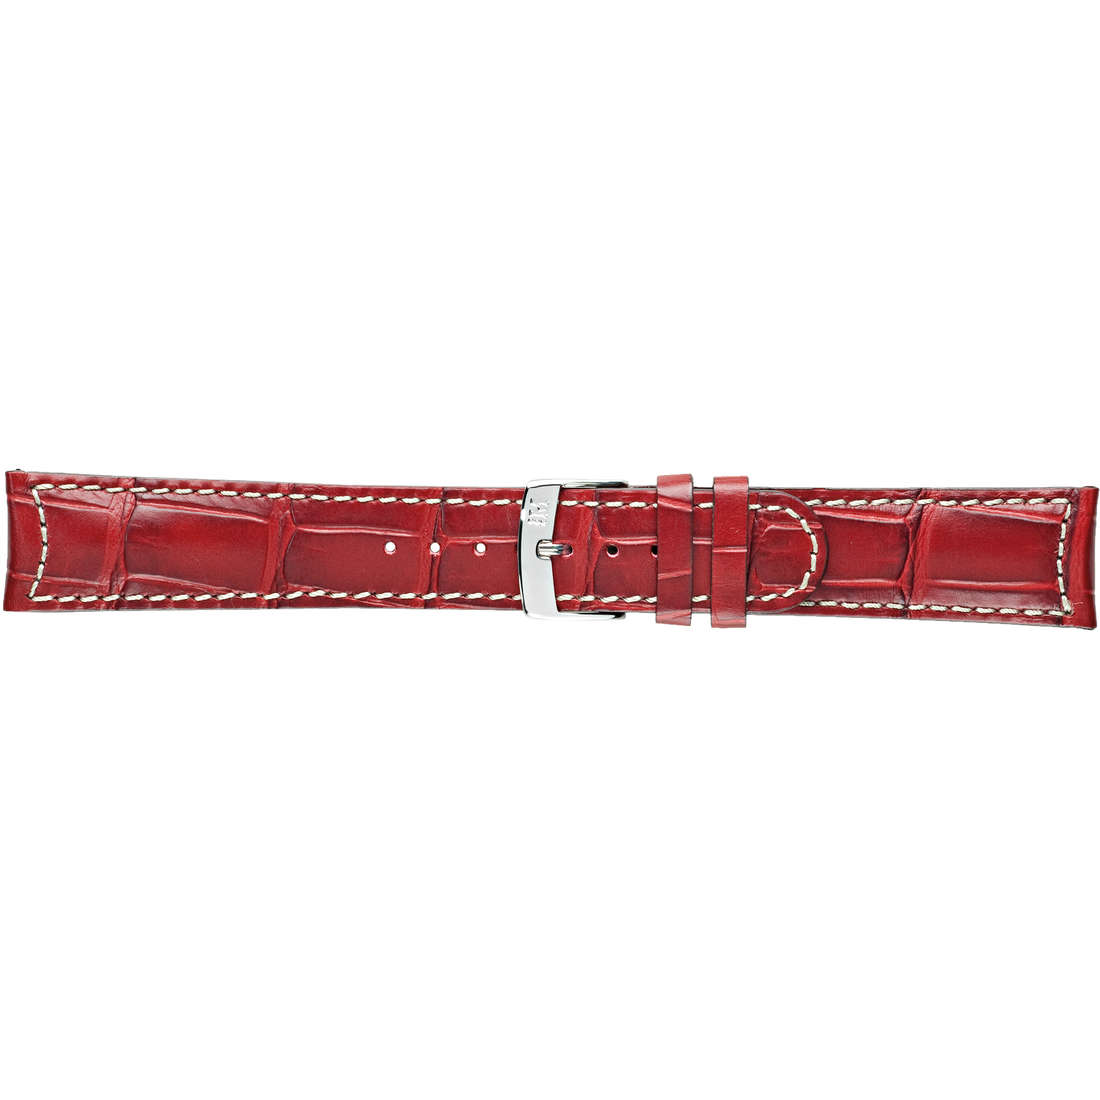 watch watch bands watch straps man Morellato Manufatti A01U3882A59080CR20